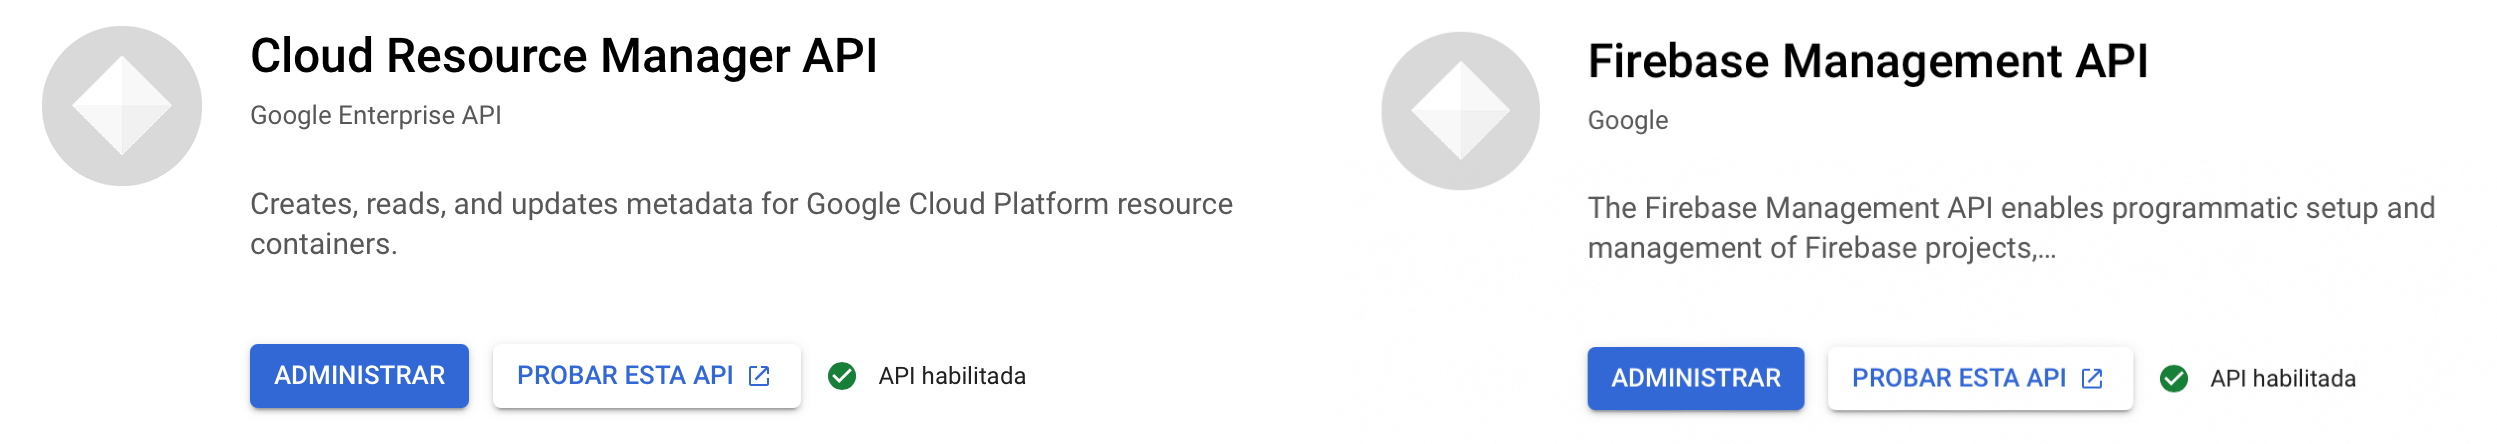 Cloud Resource Manager API y Firebase Management API